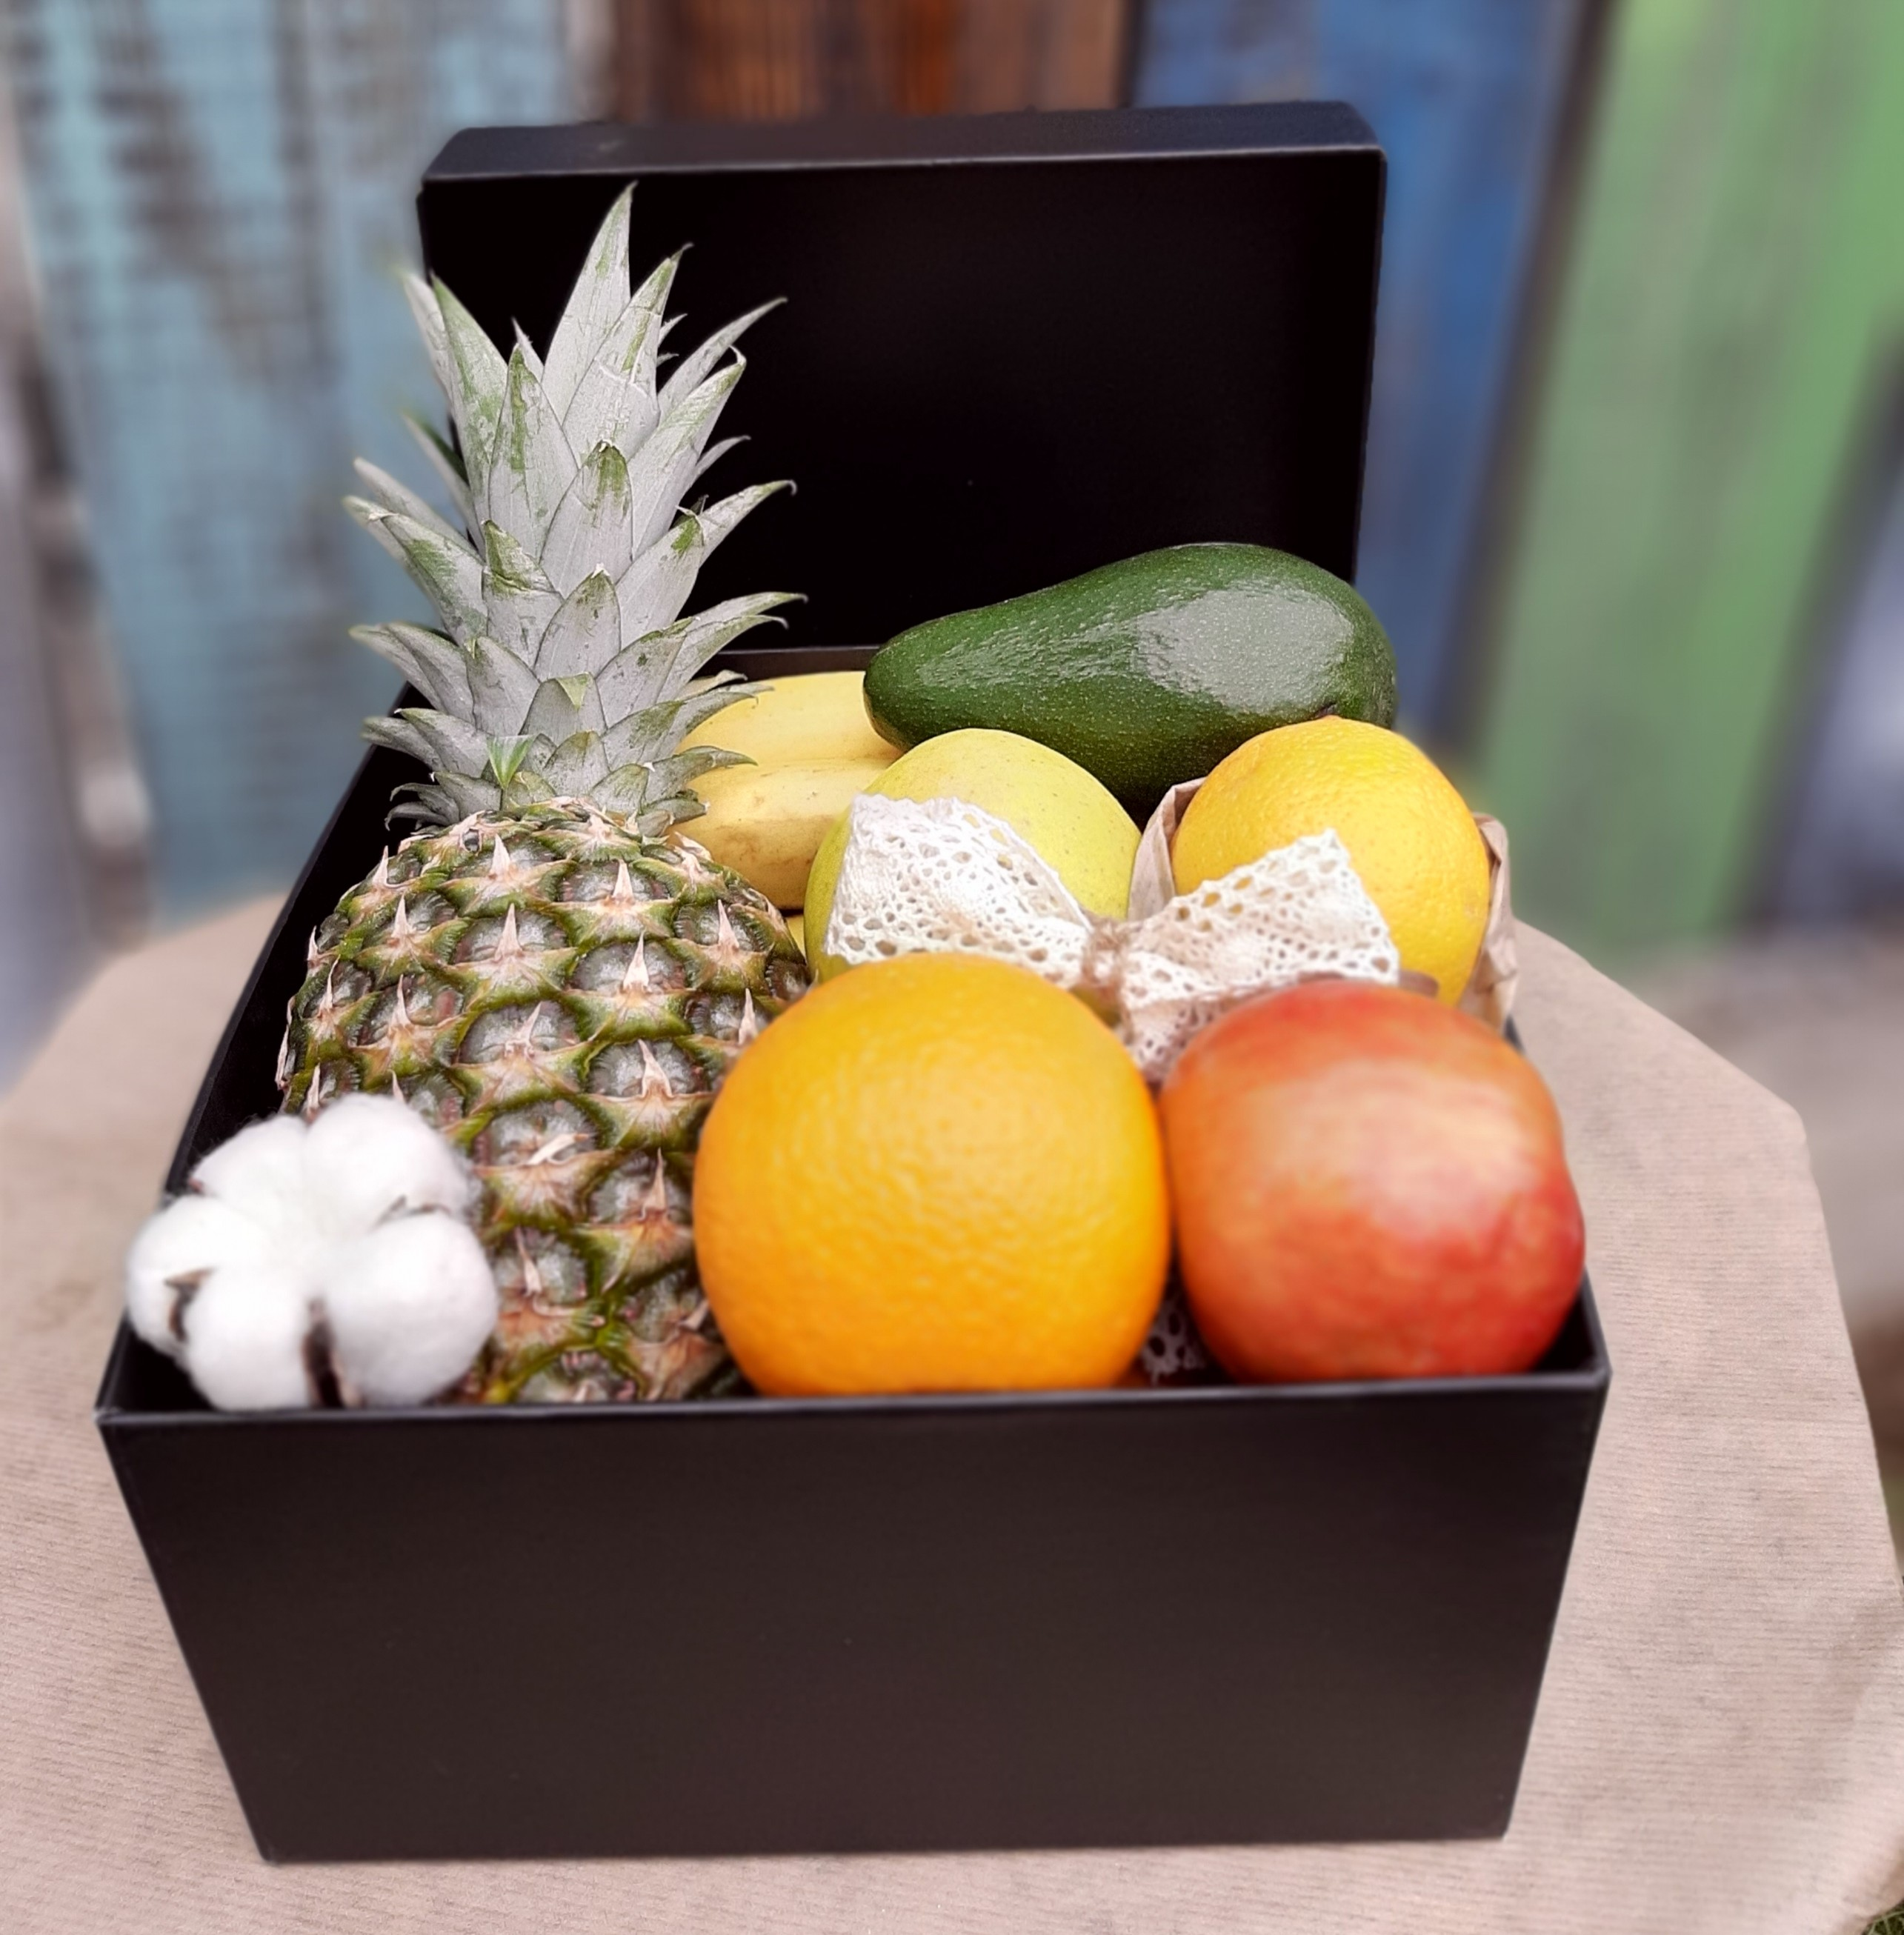 Alege si un cos cu fructe!